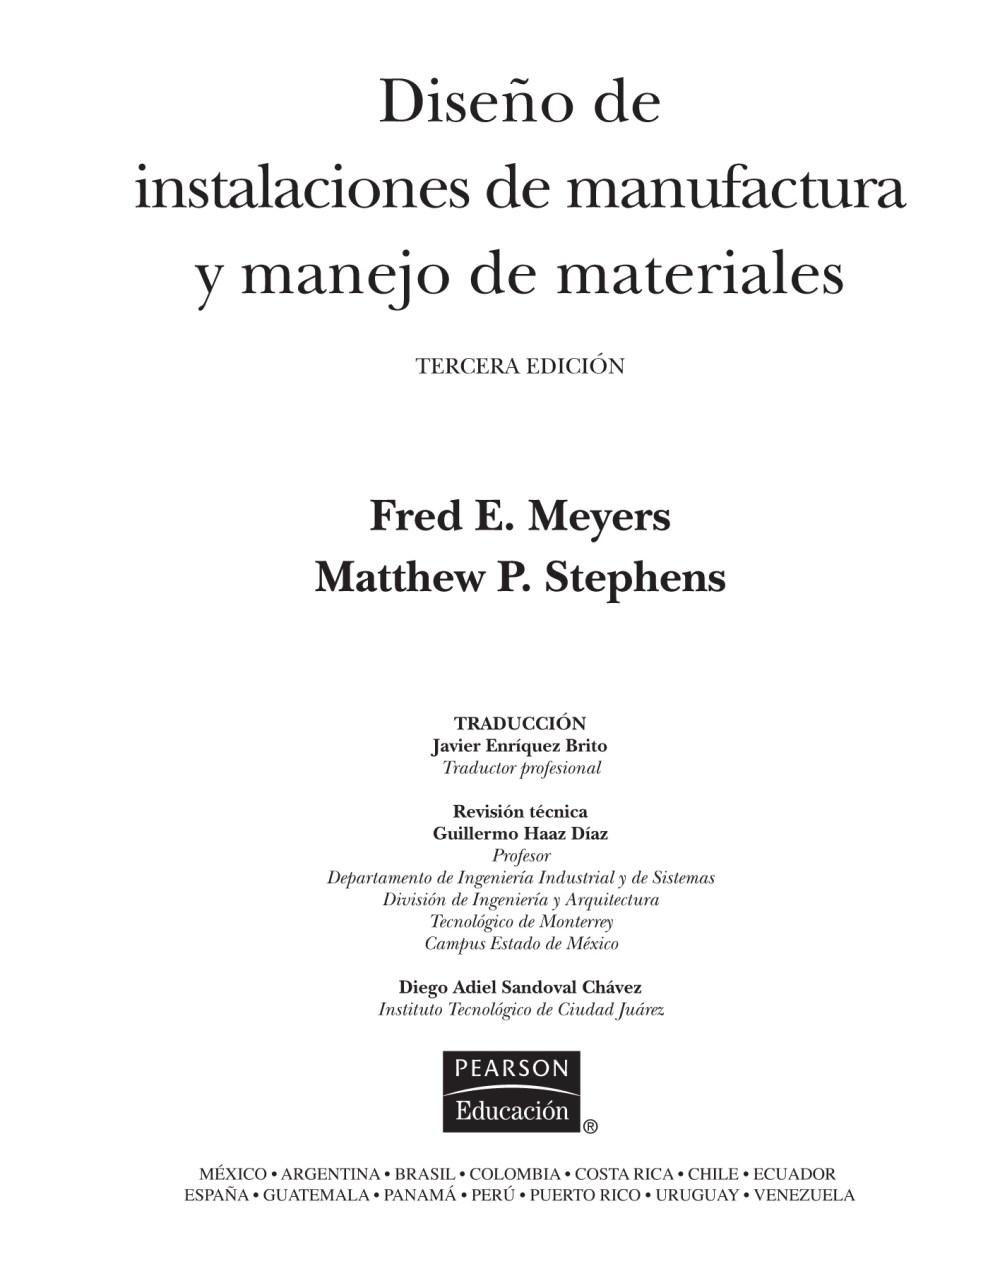 medium resolution of disec3b1o de instalaciones de manufactura pages 1 50 text version anyflip